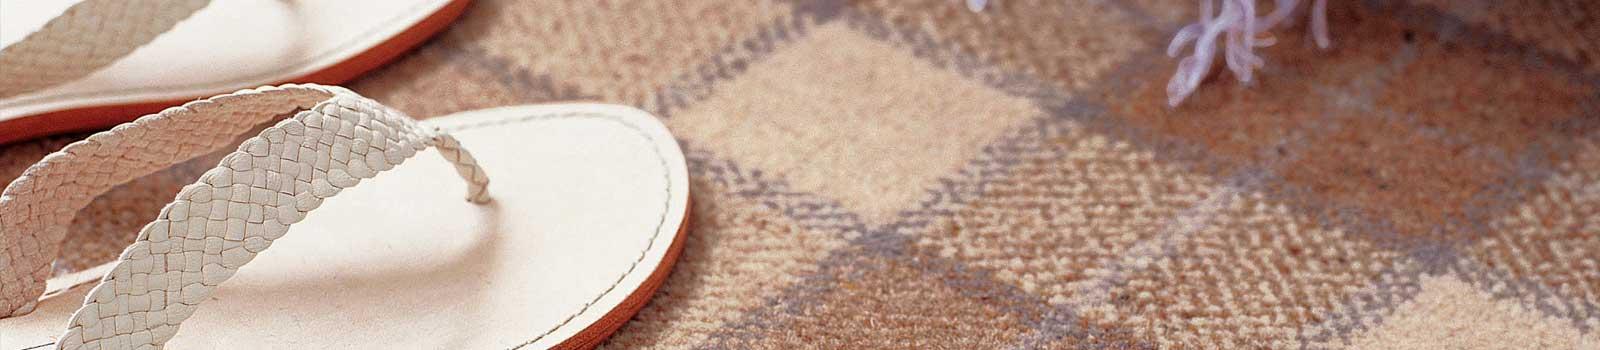 CarpetFitWales-Carpet-1600